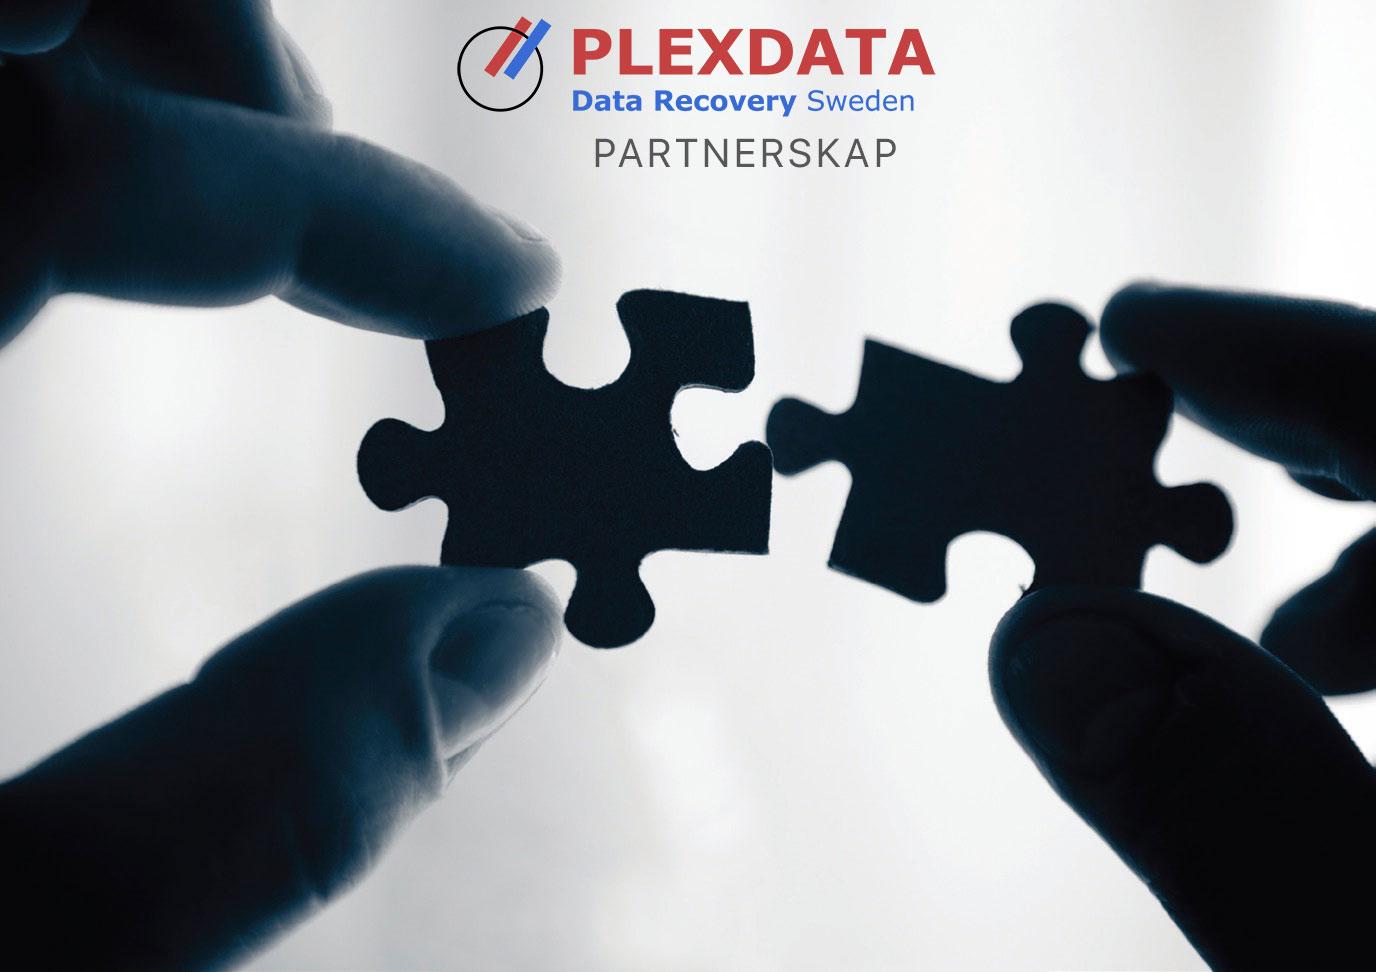 Plexdata Partner